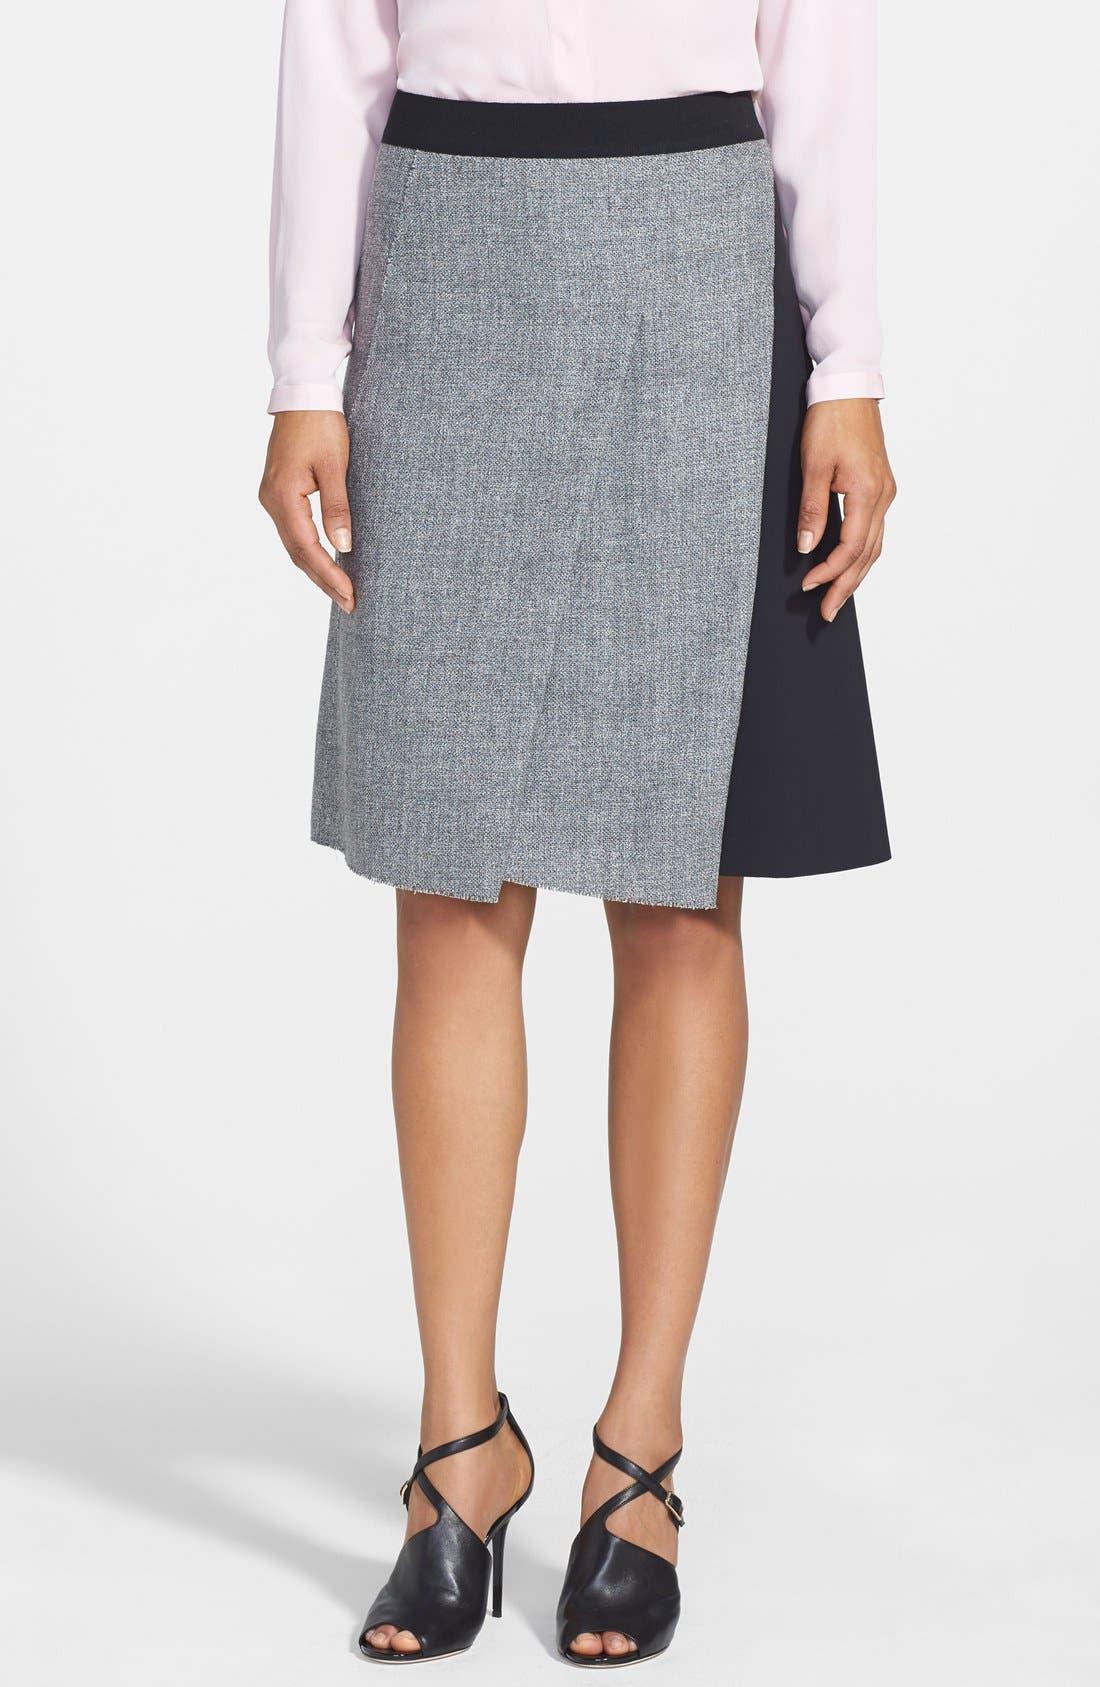 Alternate Image 1 Selected - Elie Tahari 'Larissa' Colorblock Tweed Skirt